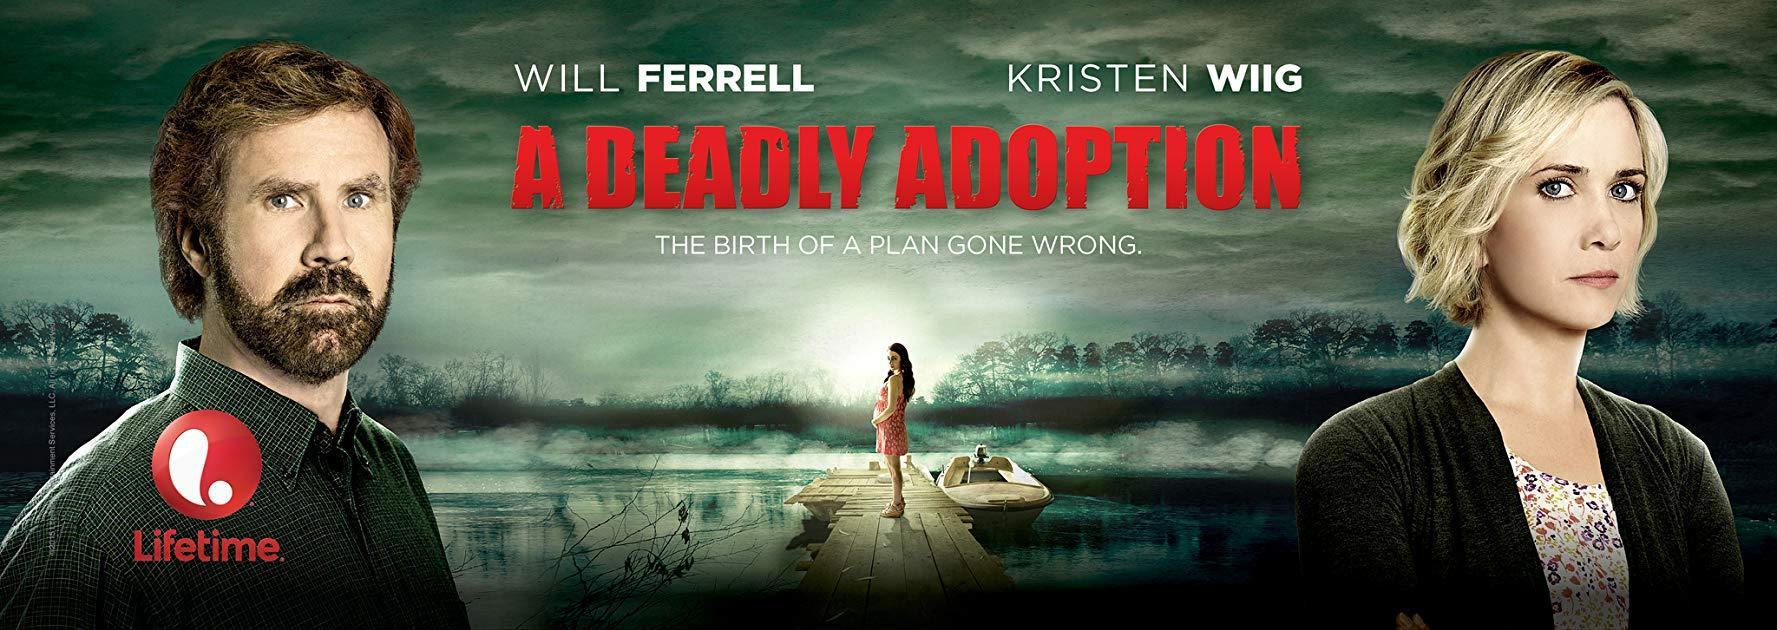 مشاهدة فيلم A Deadly Adoption 2015 HD مترجم كامل اون لاين